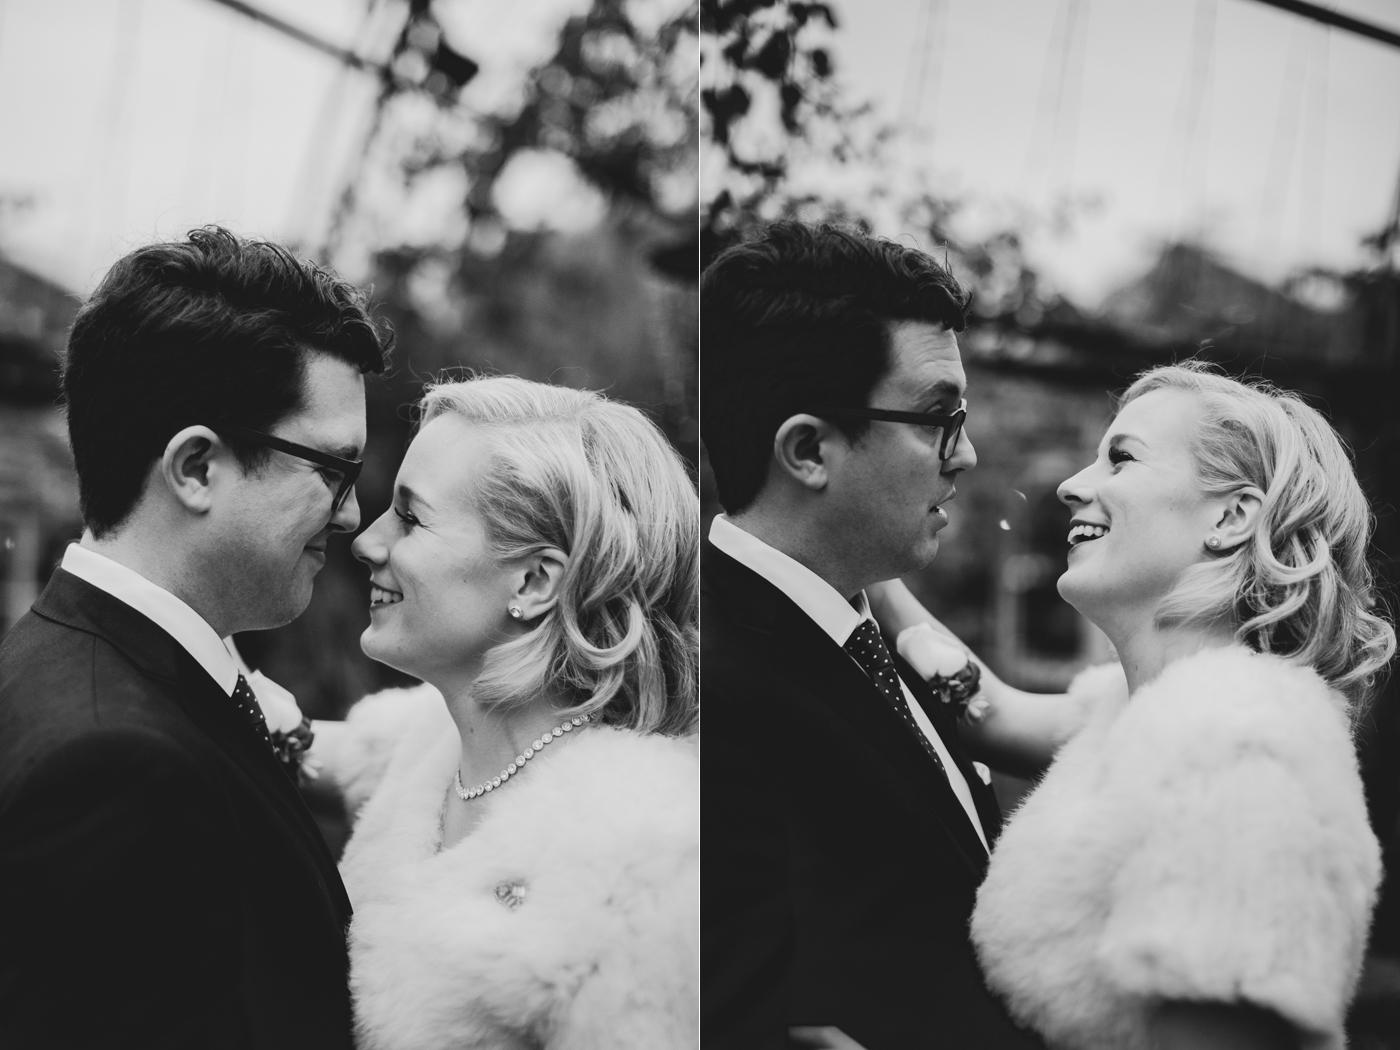 Jo & Tom Wedding - The Grounds of Alexandria - Samantha Heather Photography-224.jpg